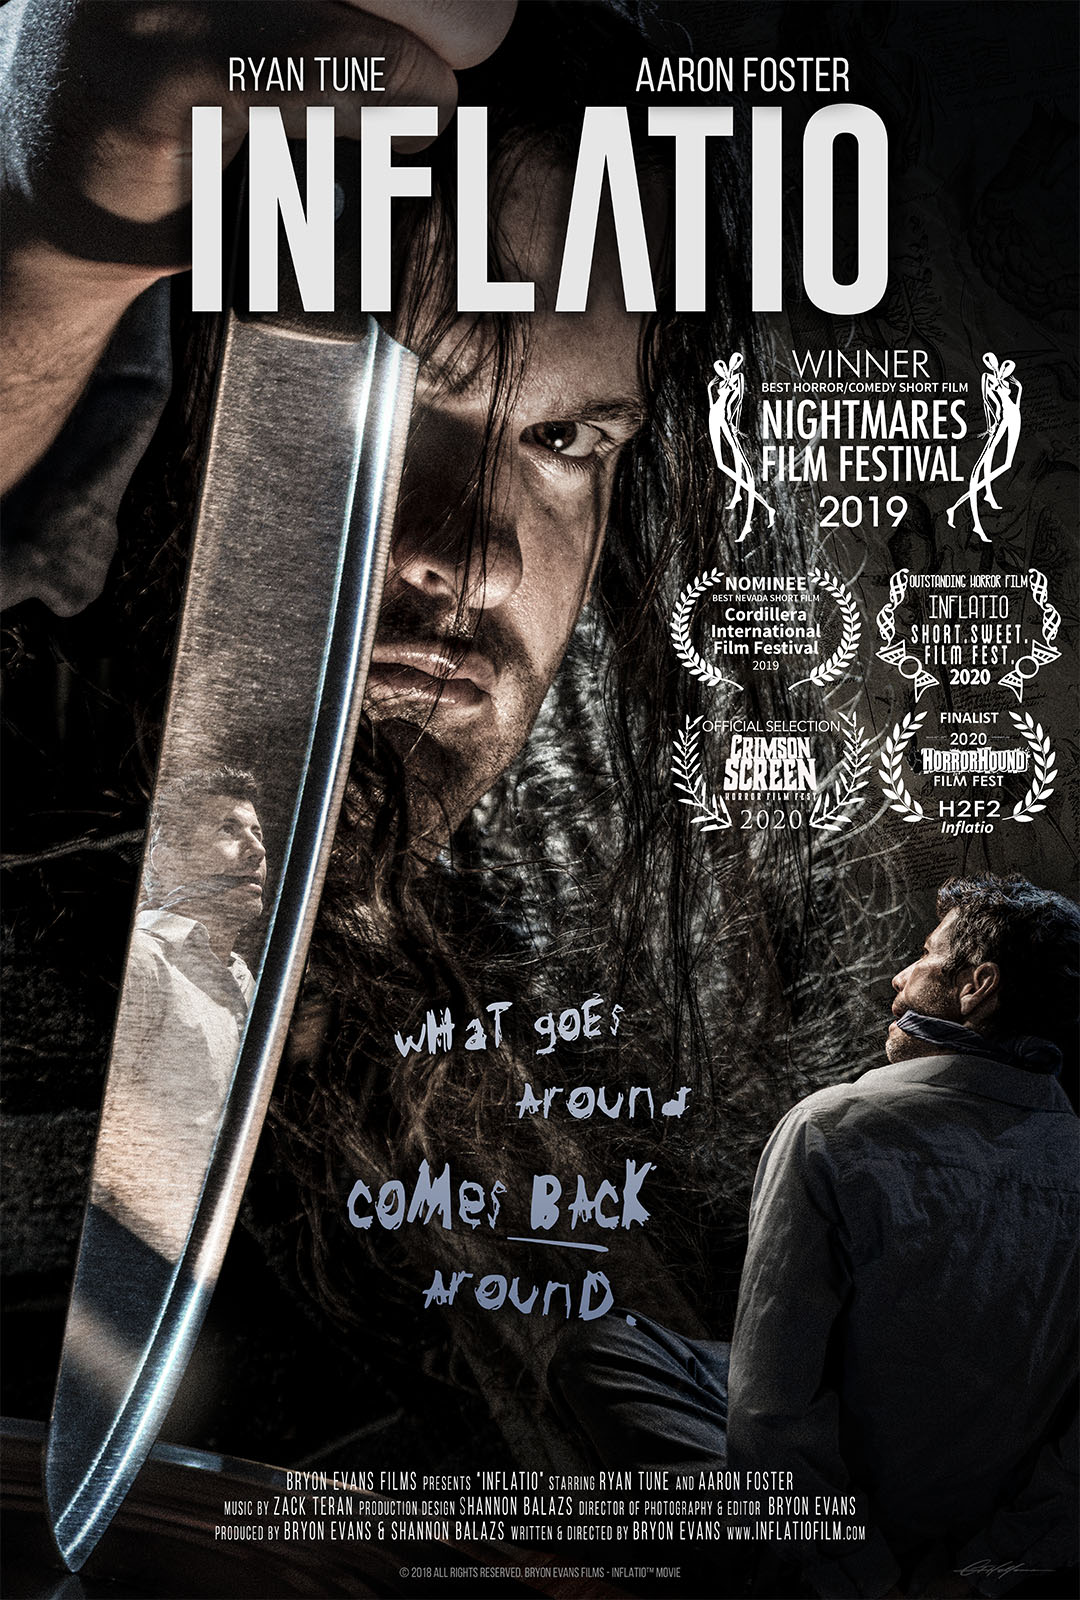 Inflatio Movie Poster